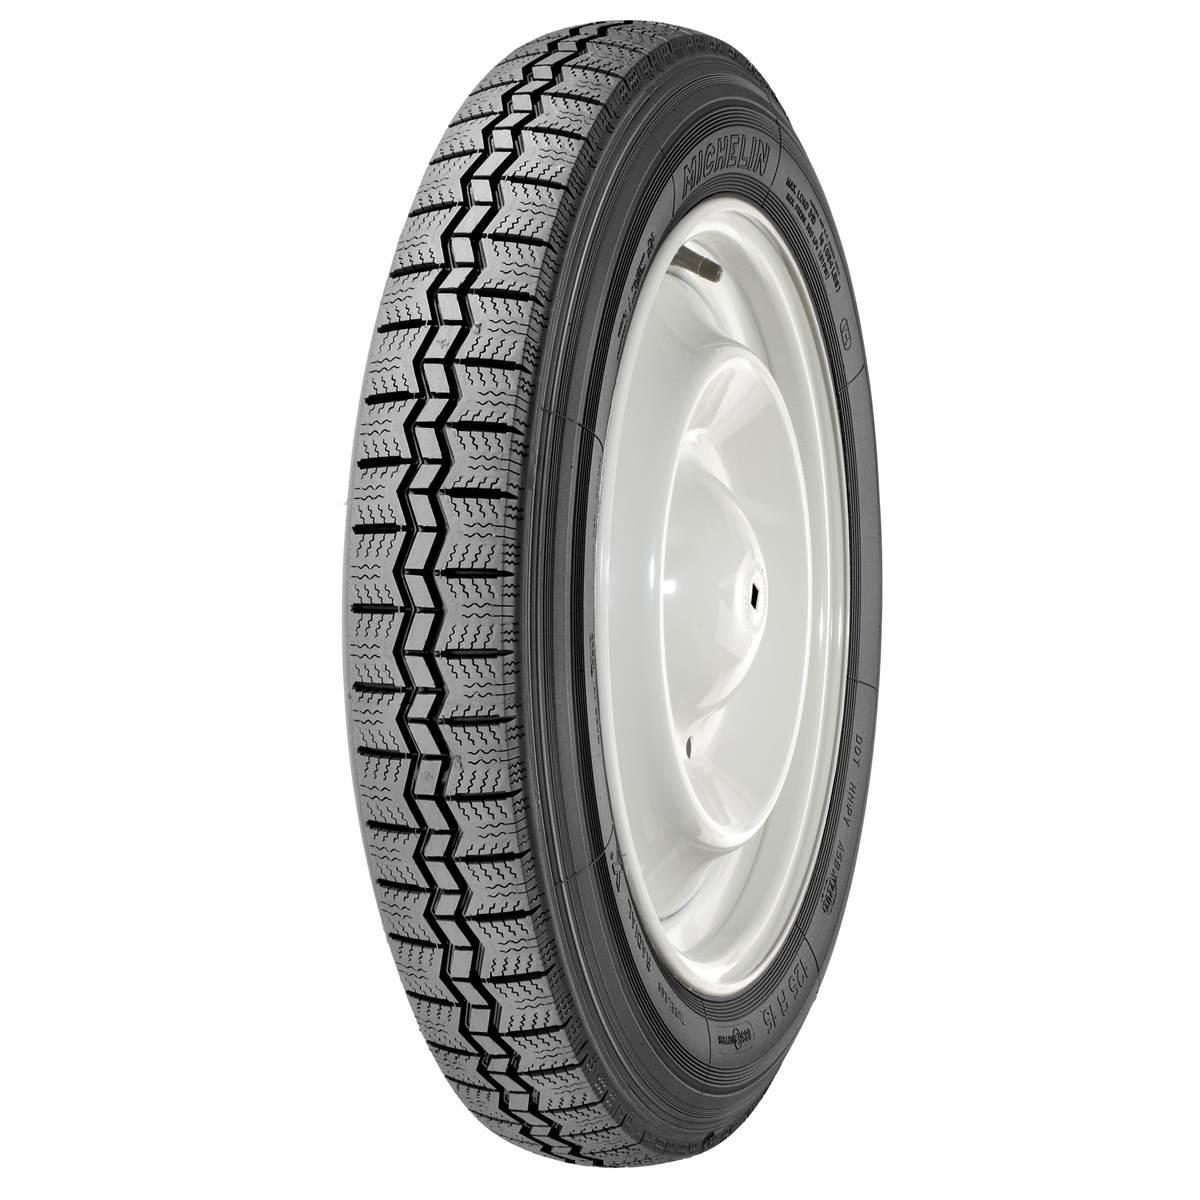 Pneu Michelin Collection 155/80R14 80T X